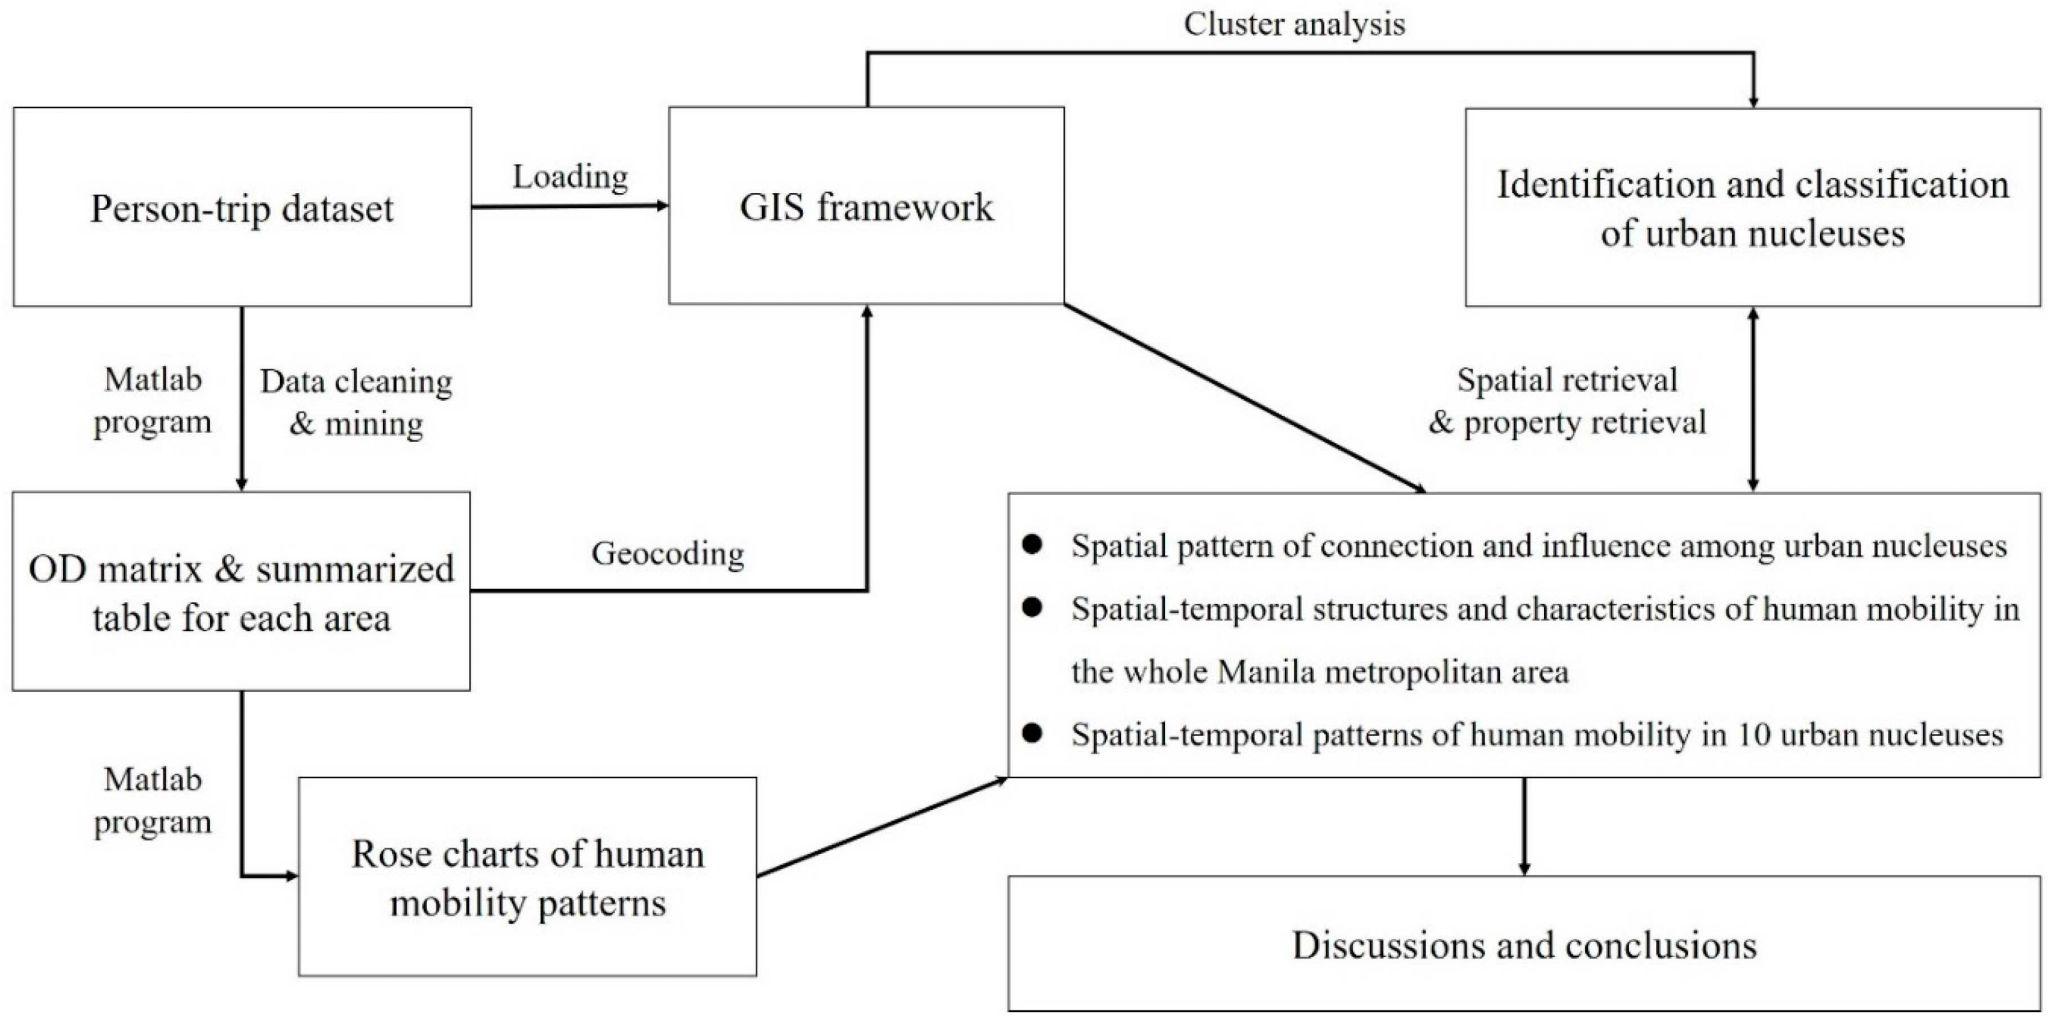 Motion Graphysis Worksheet Key